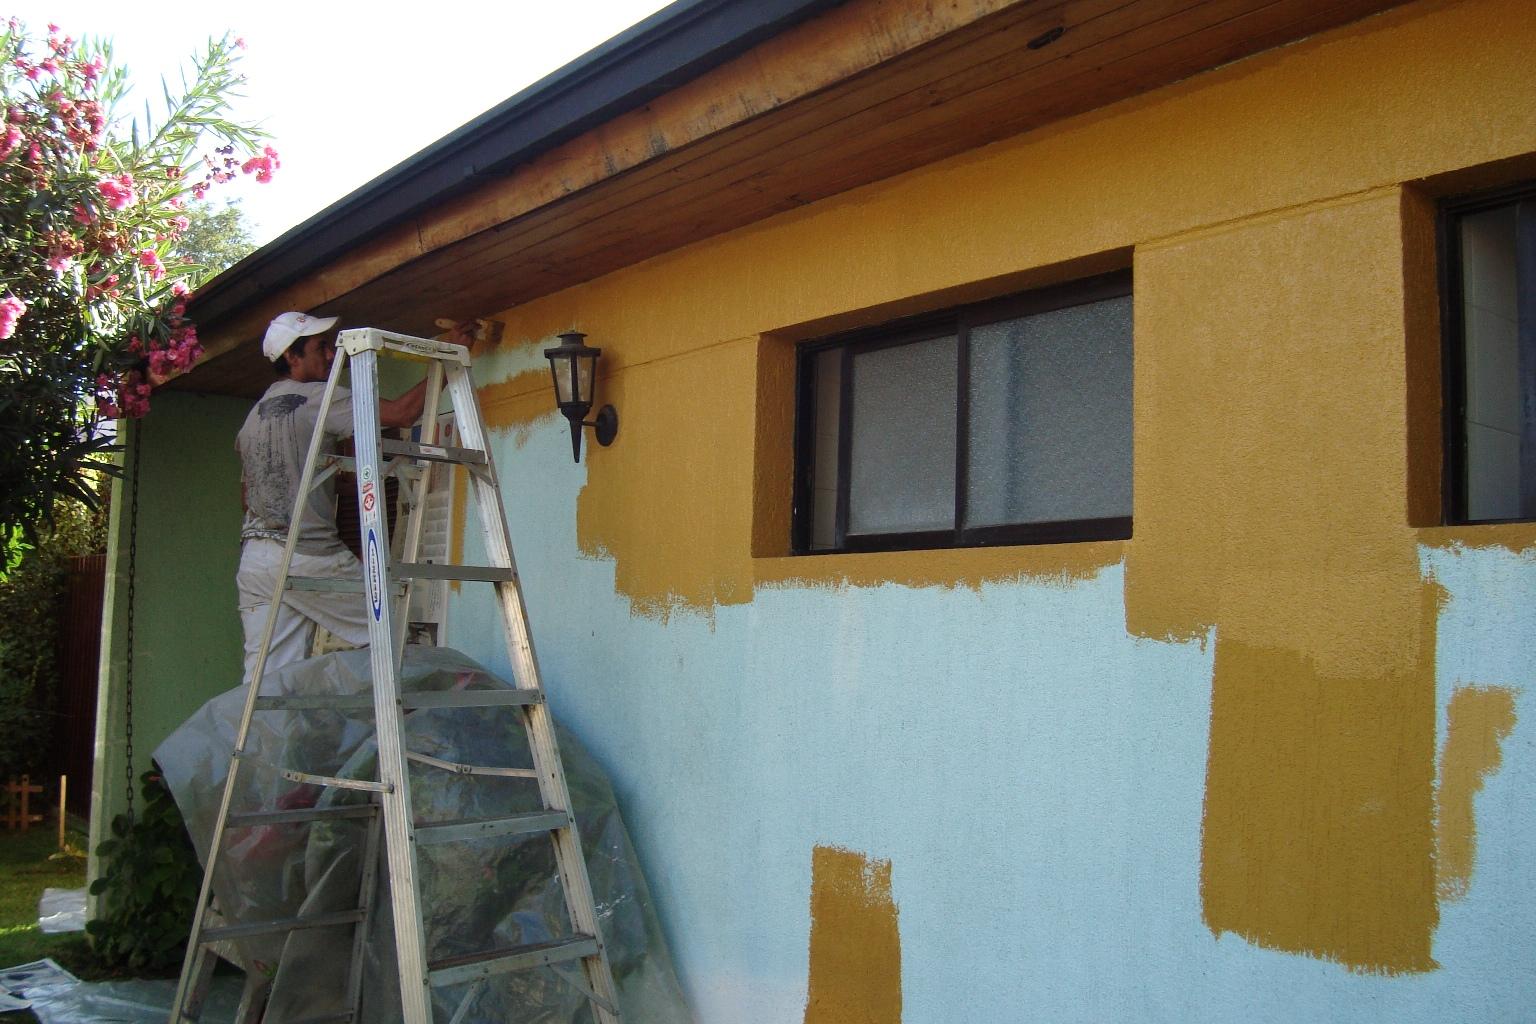 Construcci n total for Pintura para pared exterior